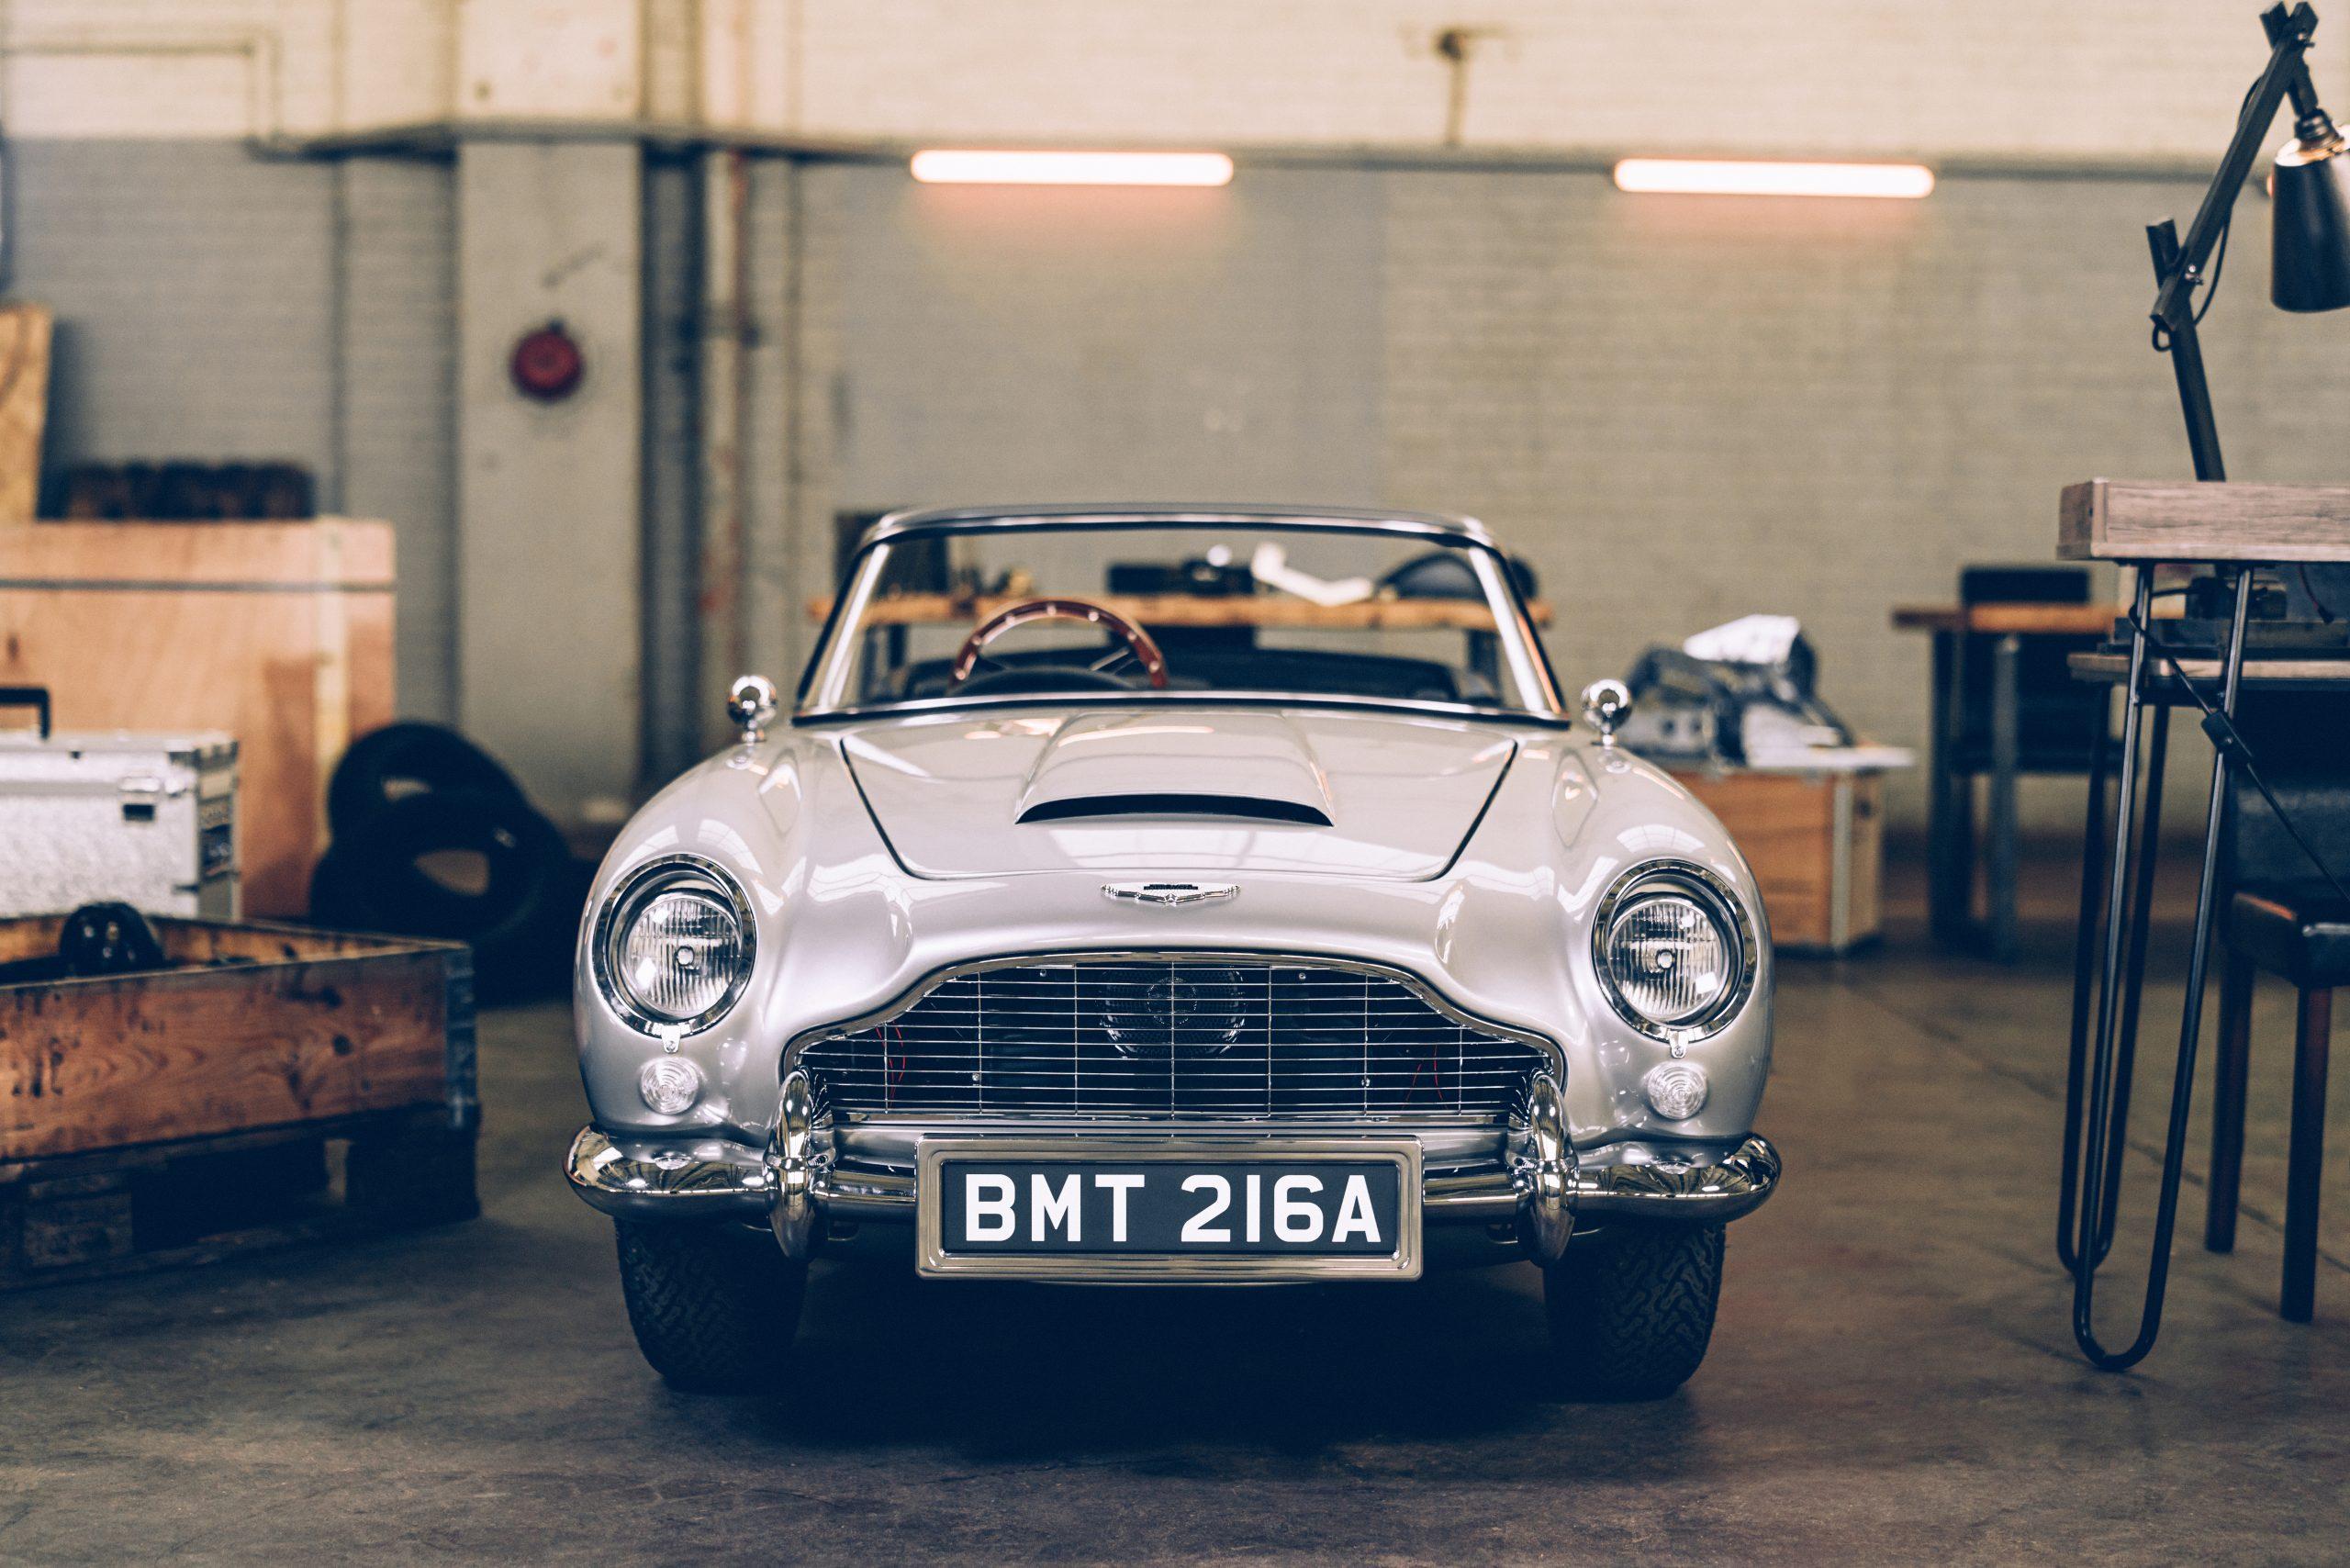 Aston Martin DB5 Junior No Time To Die Edition